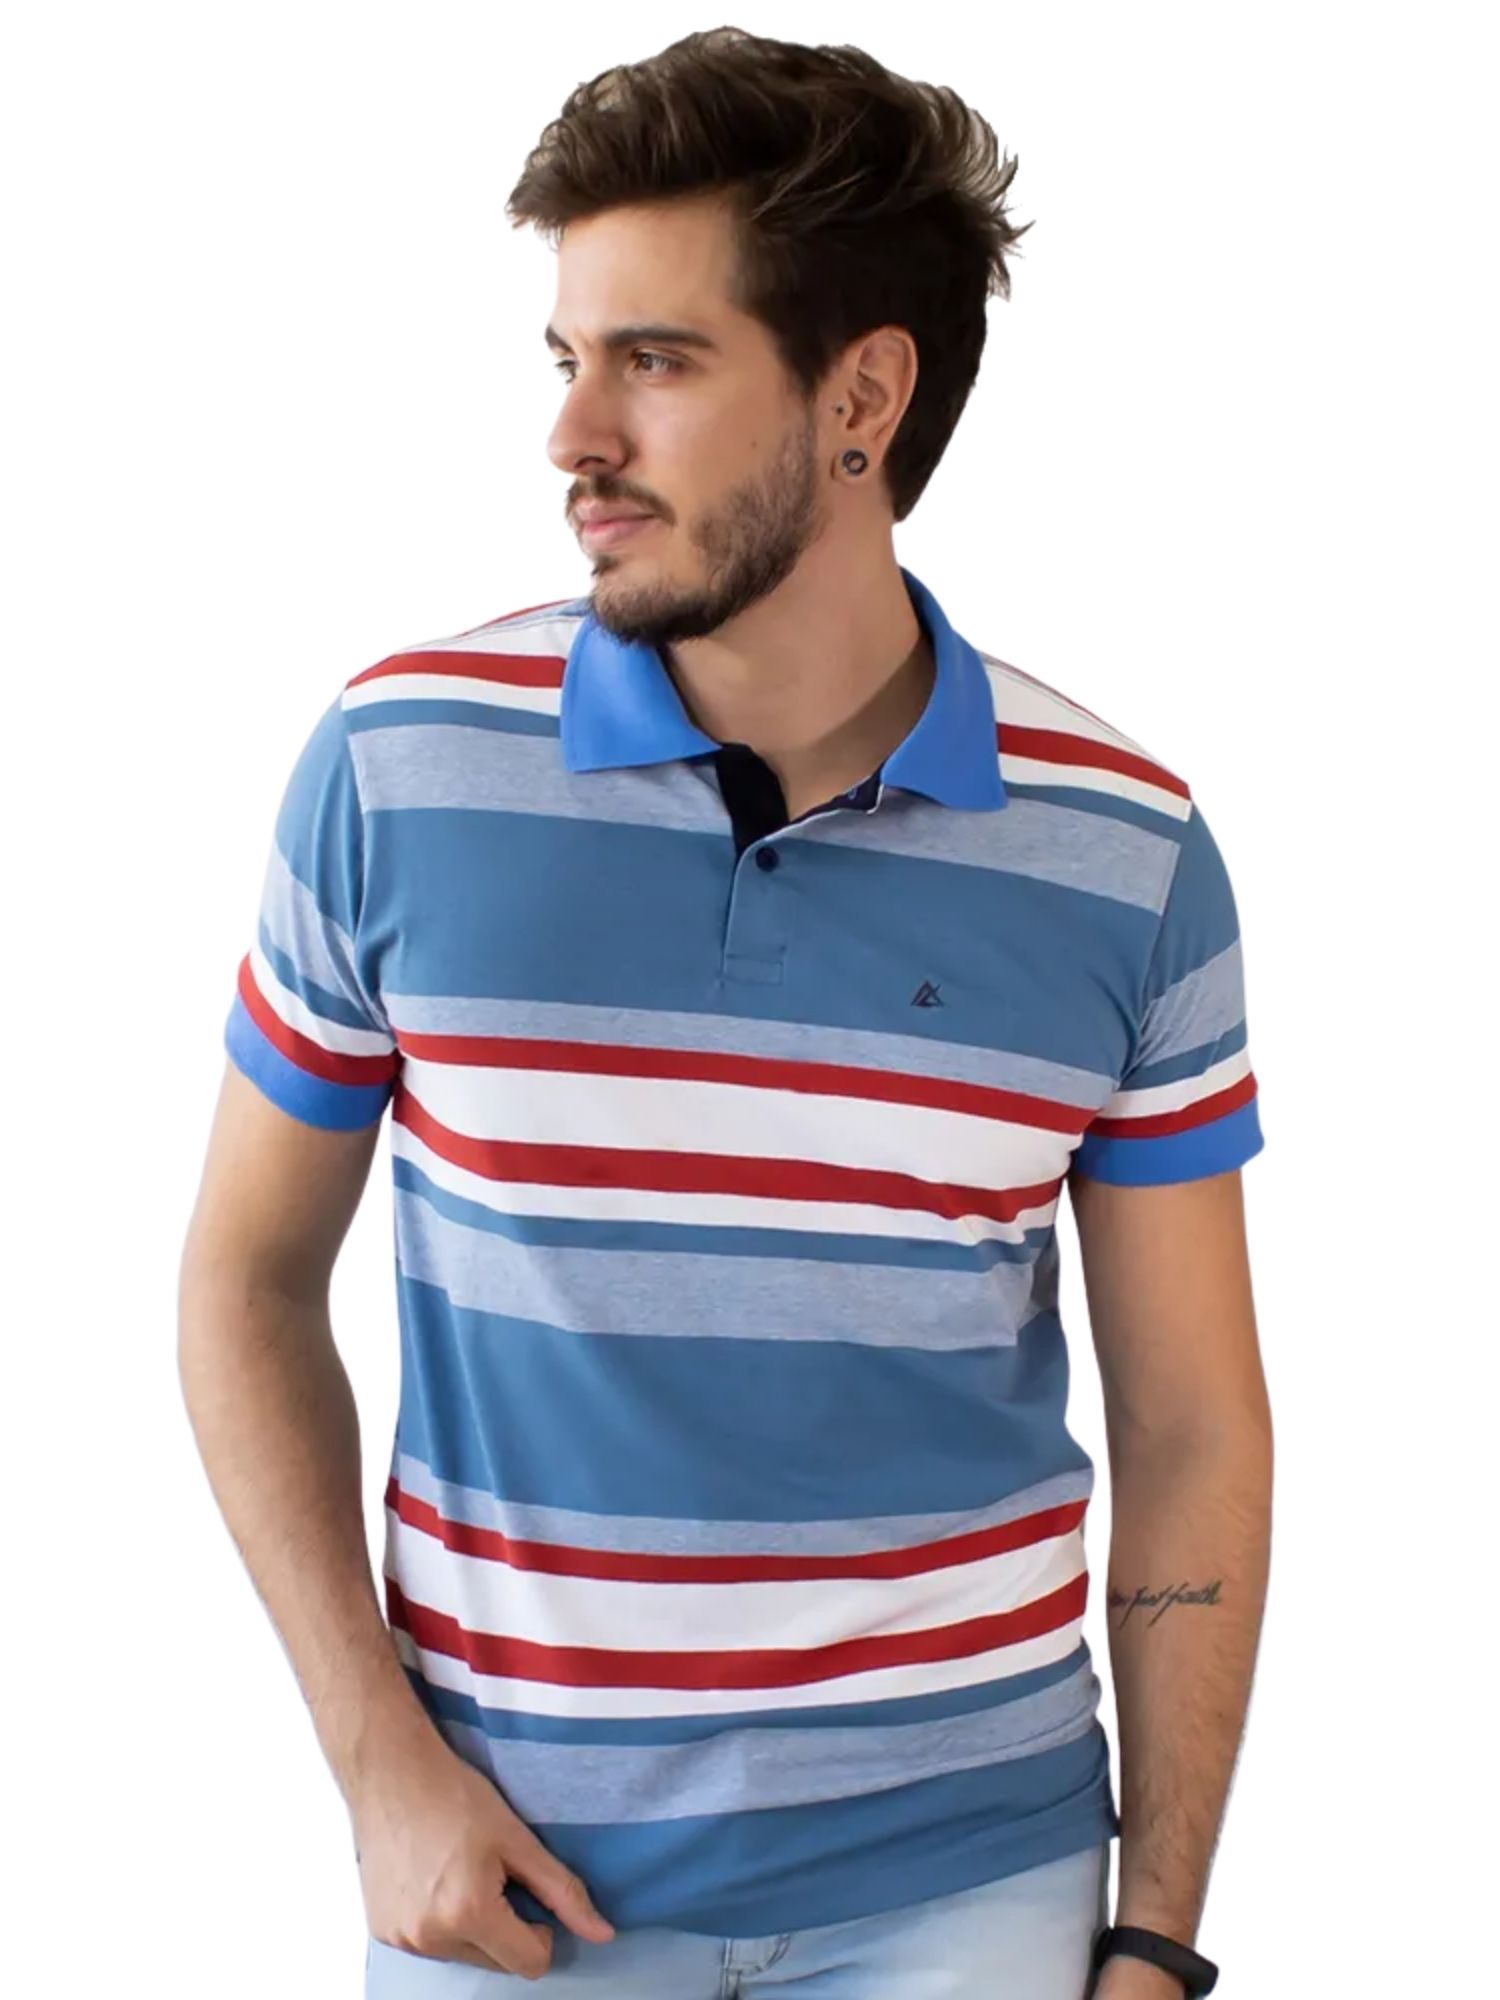 Camiseta Polo Listrada Anticorpus  52227